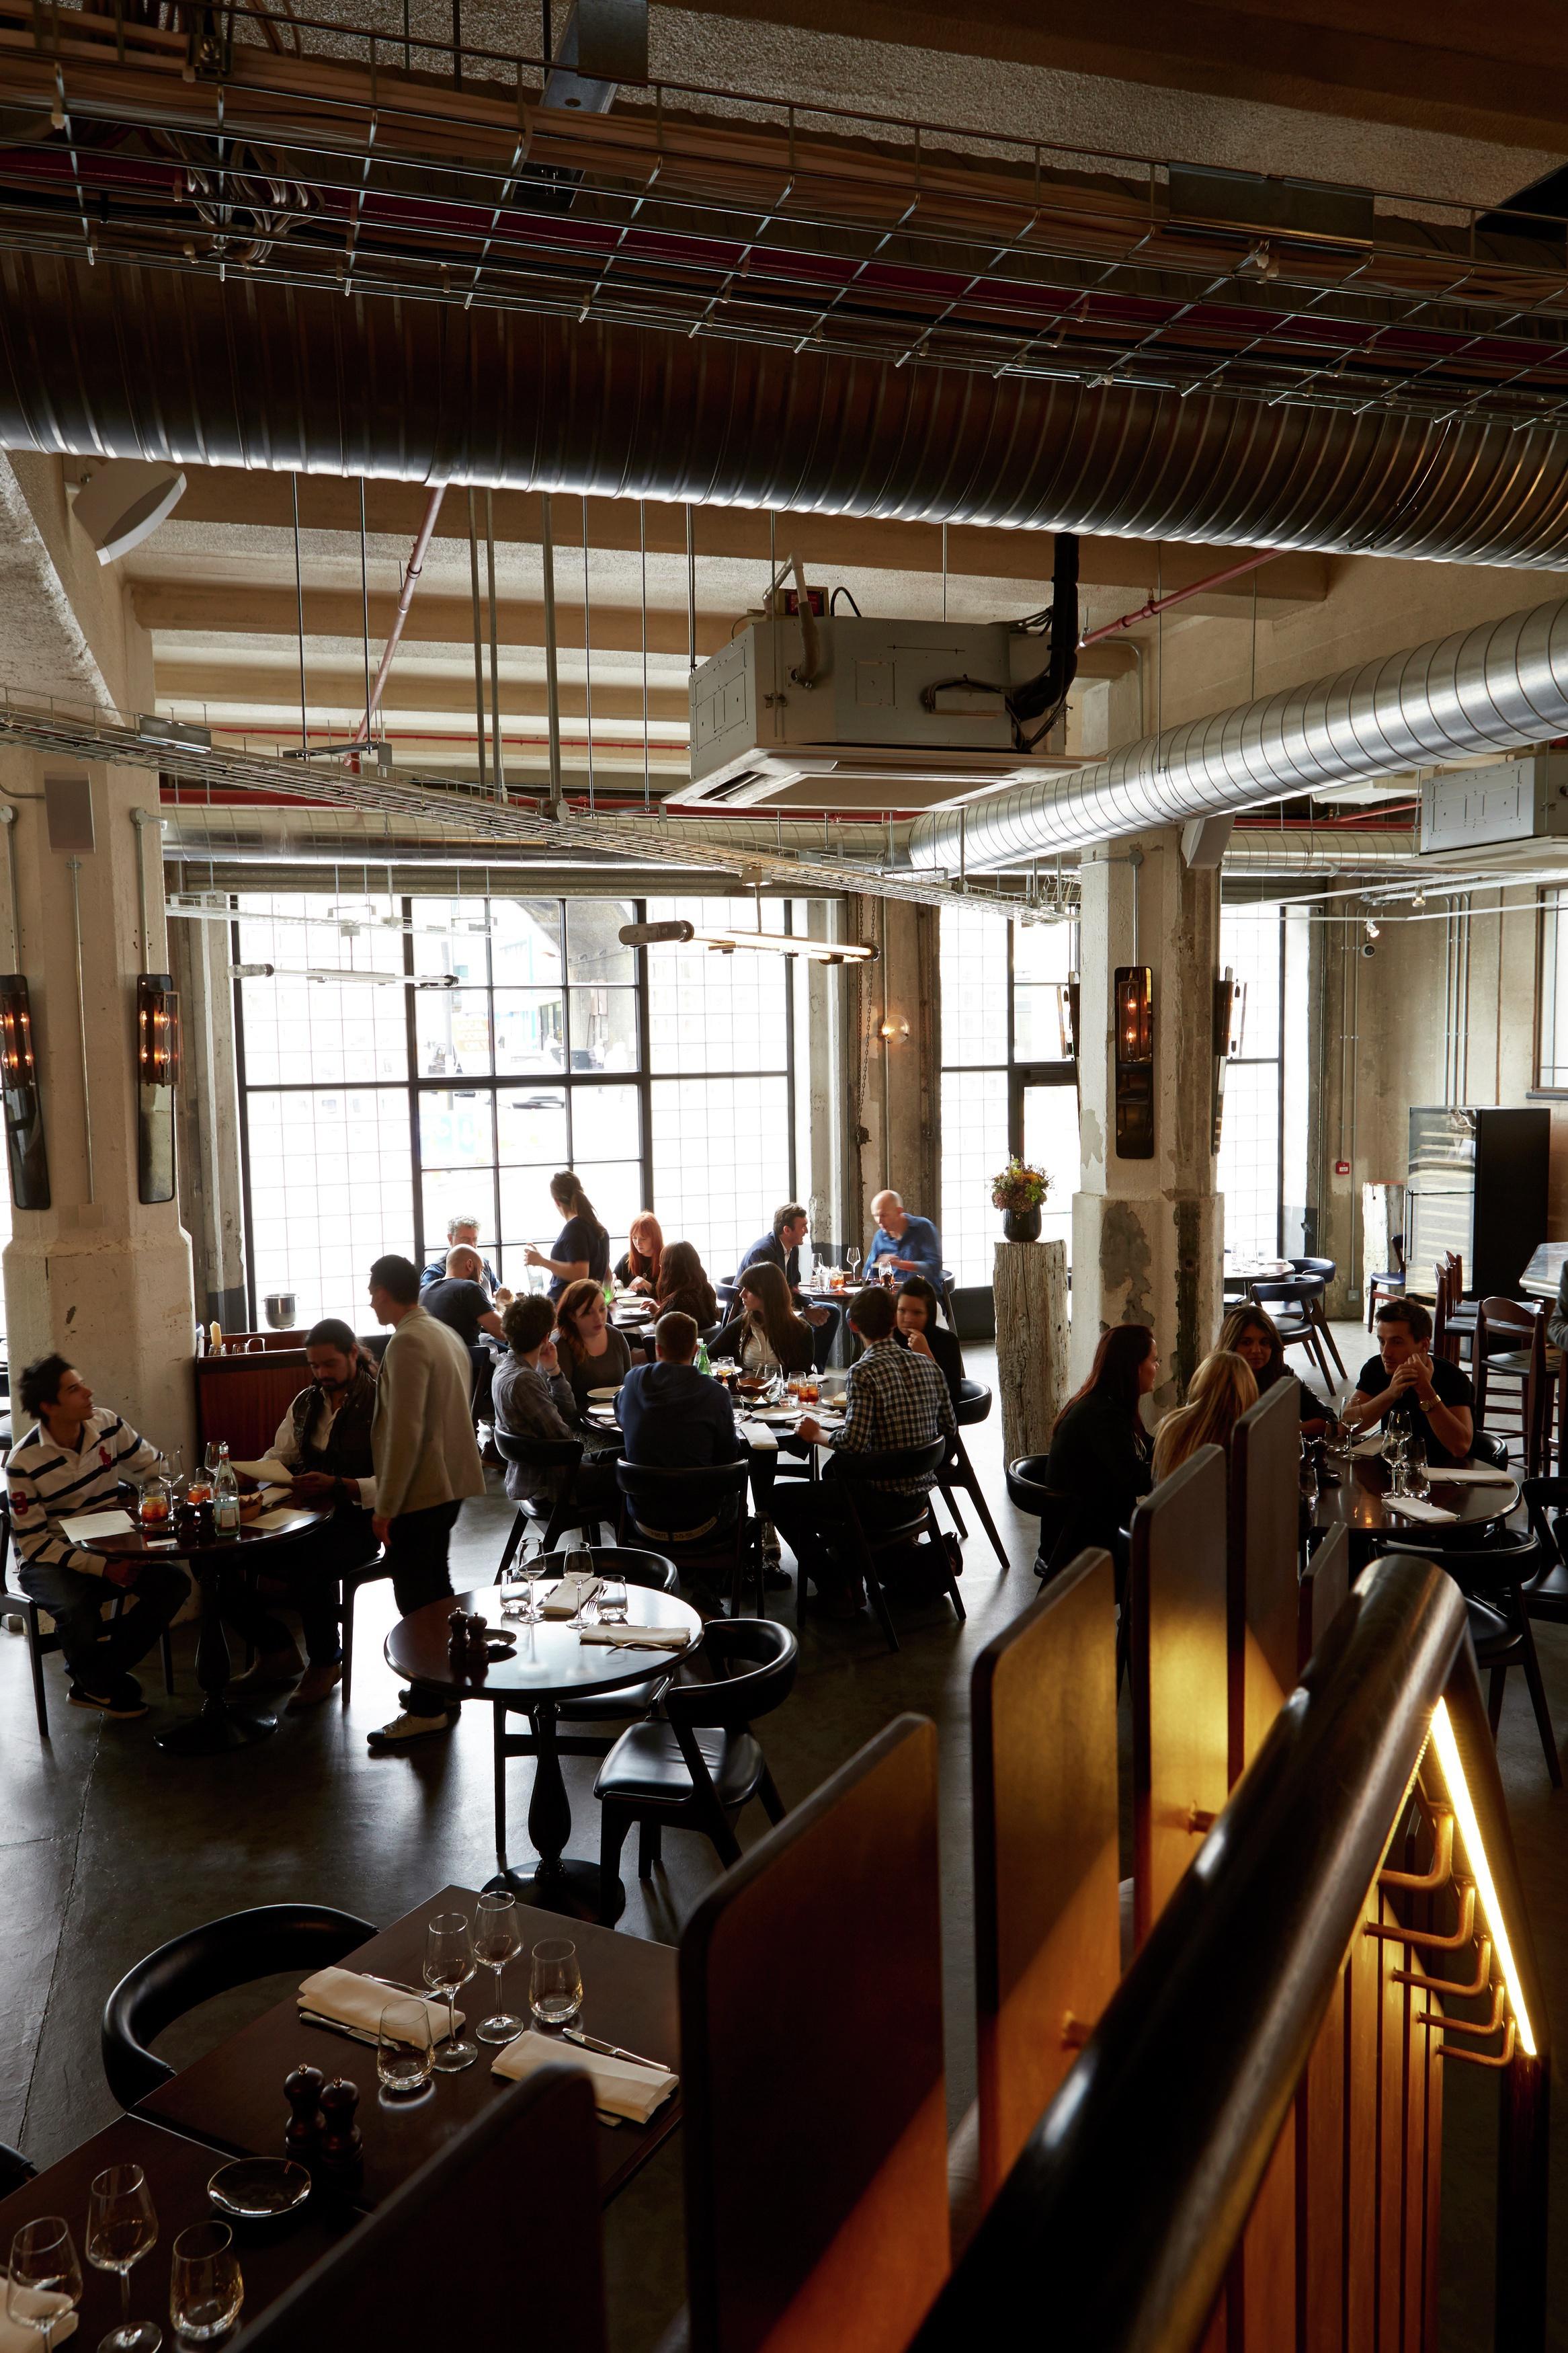 union street cafe, london - restaurant review - lisa eats world